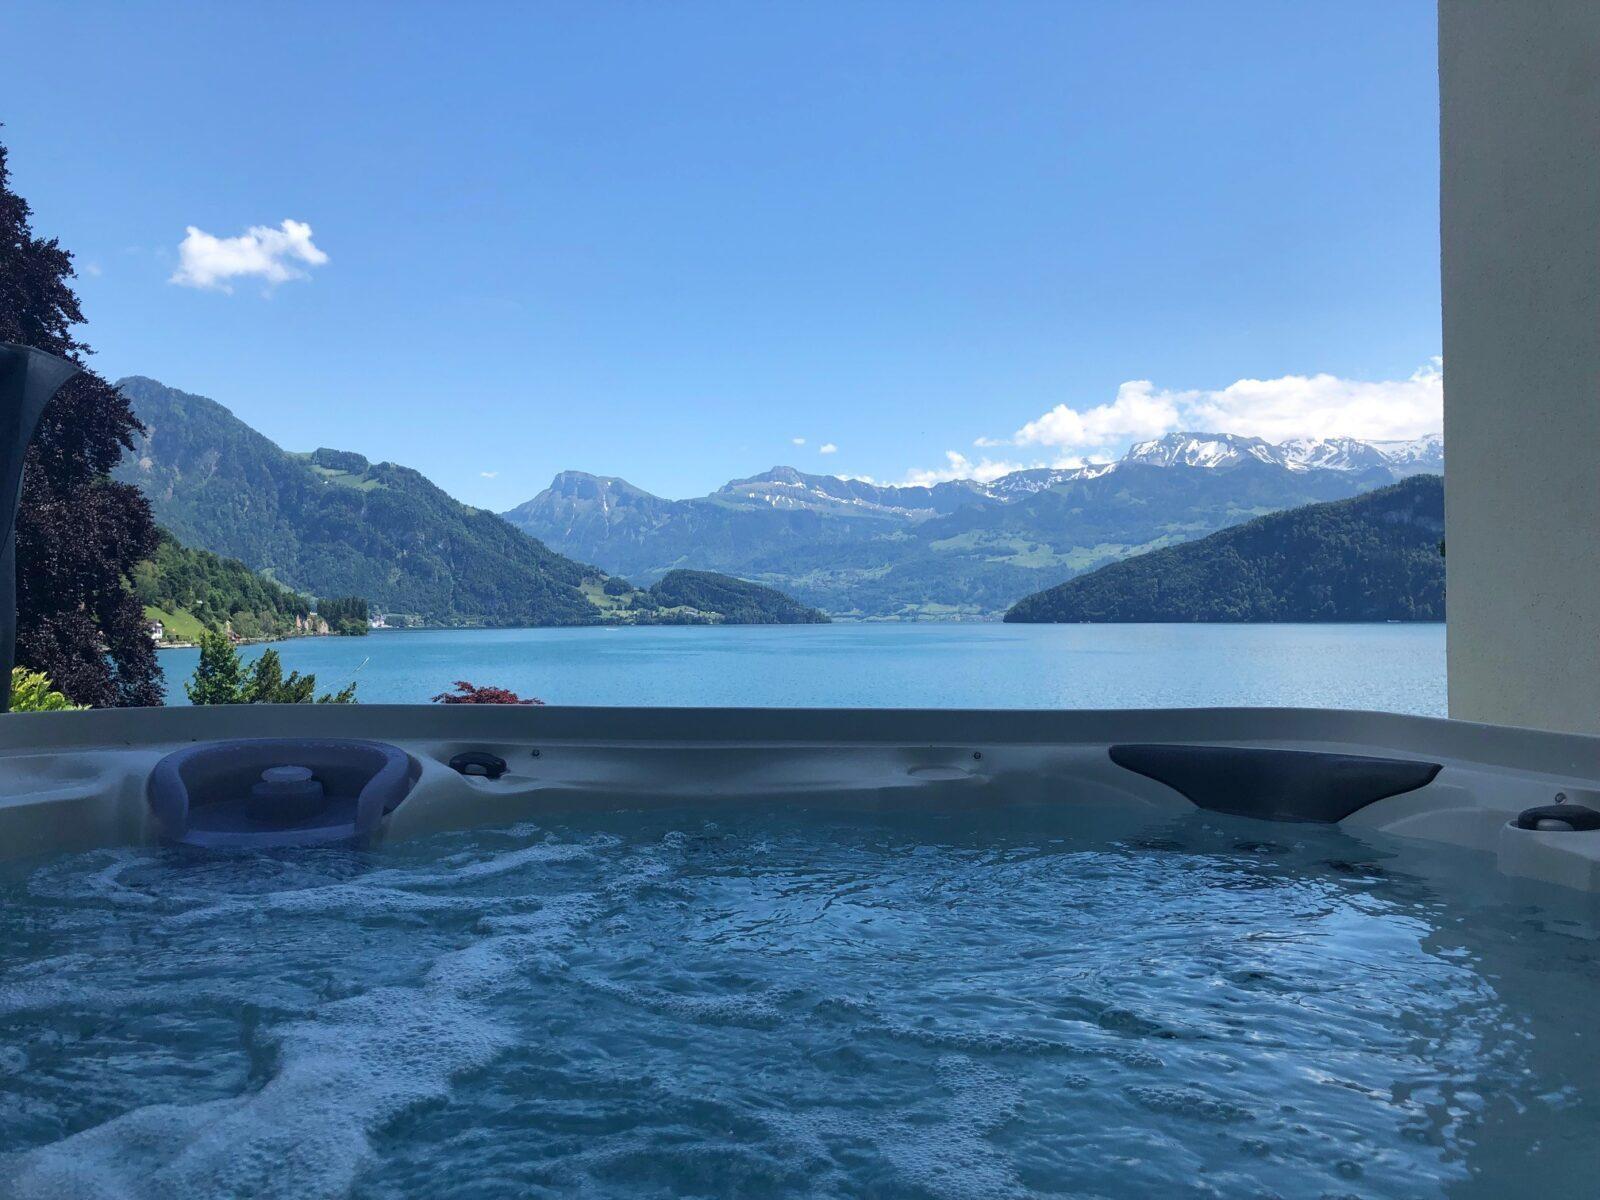 Walter Hopp Real Estate - Mein Haus am See